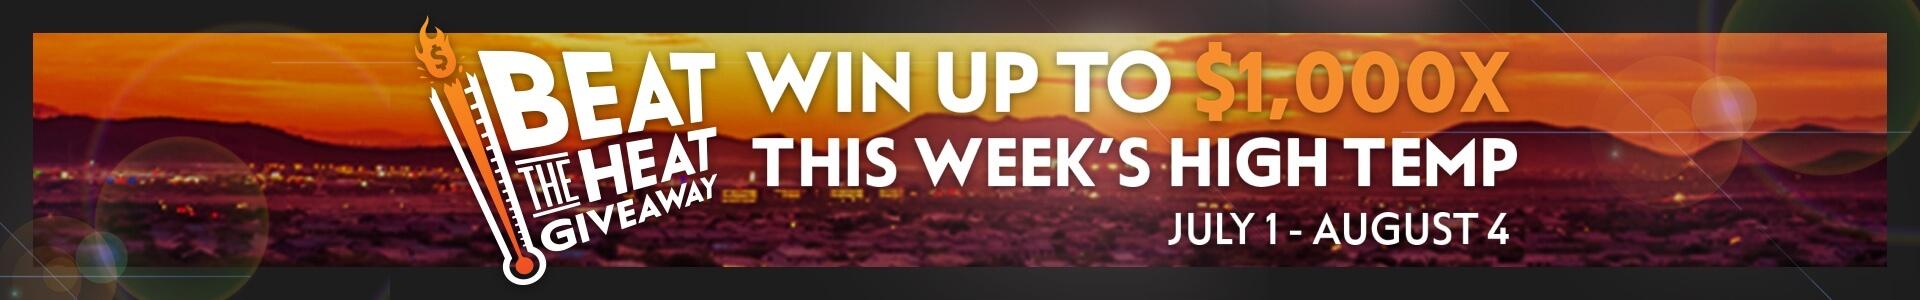 Arizona Lottery Players Club - Promotions